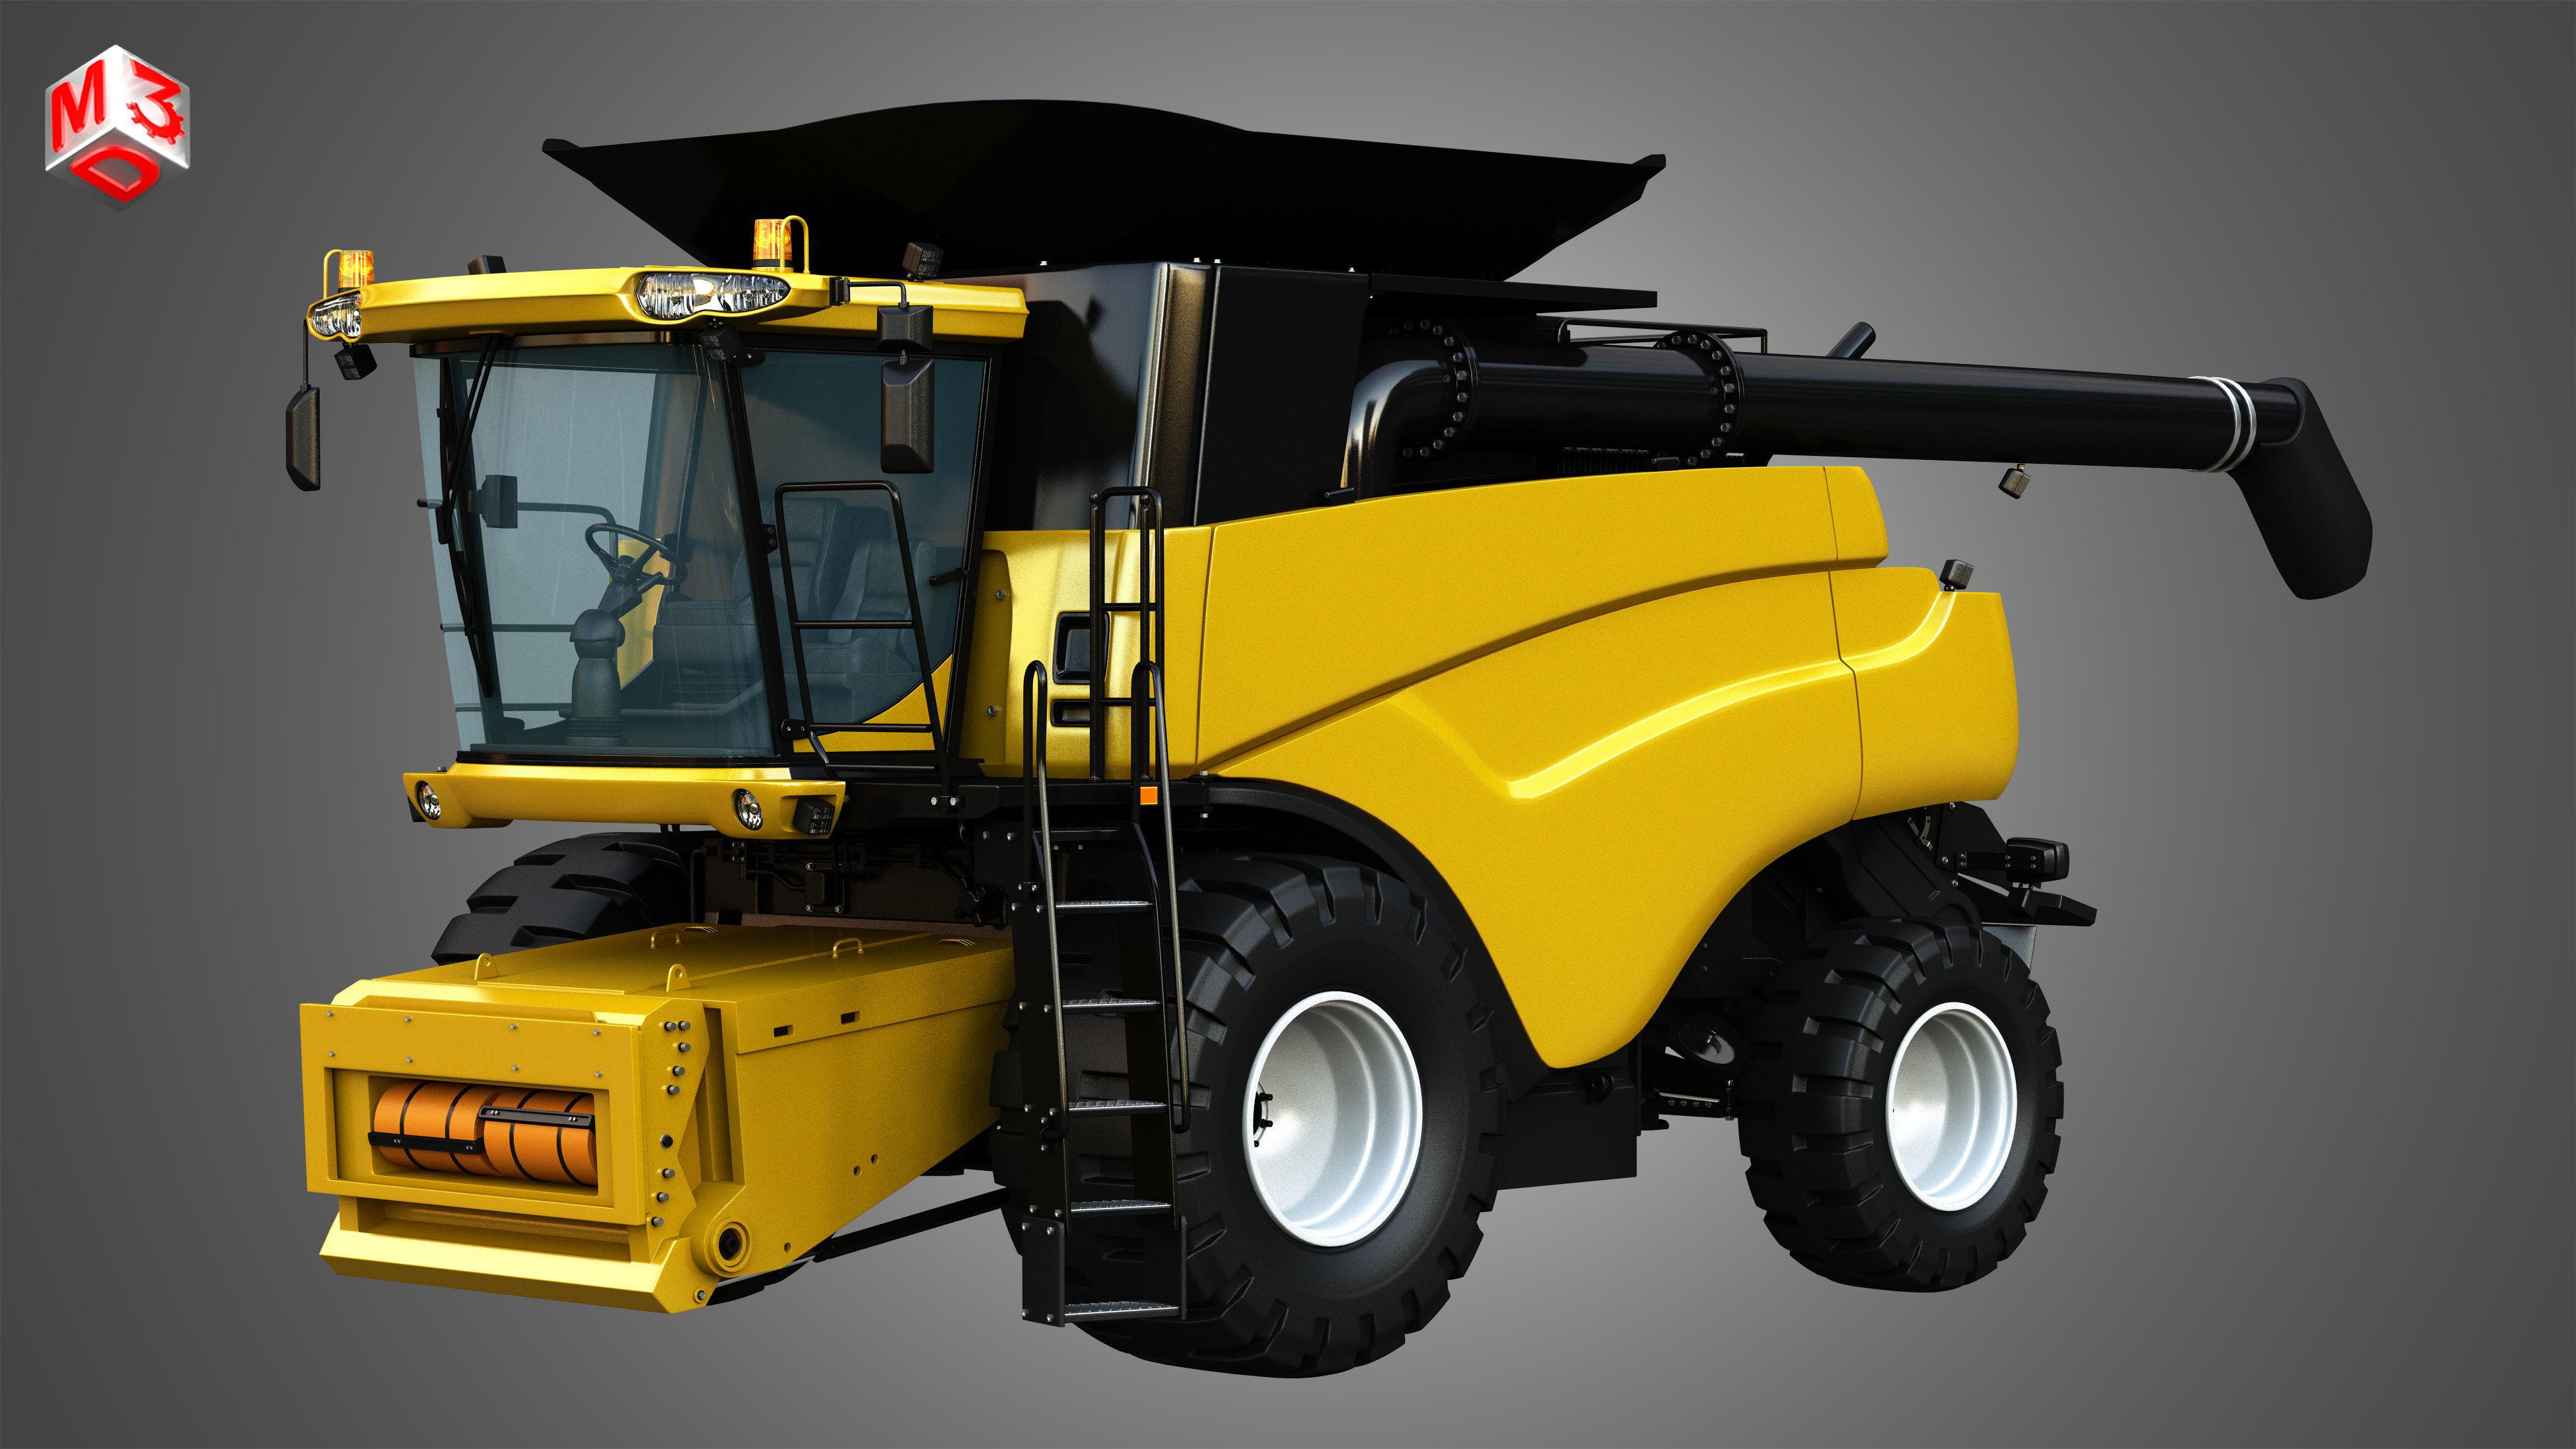 NH - CR 9070 Combine Harvester